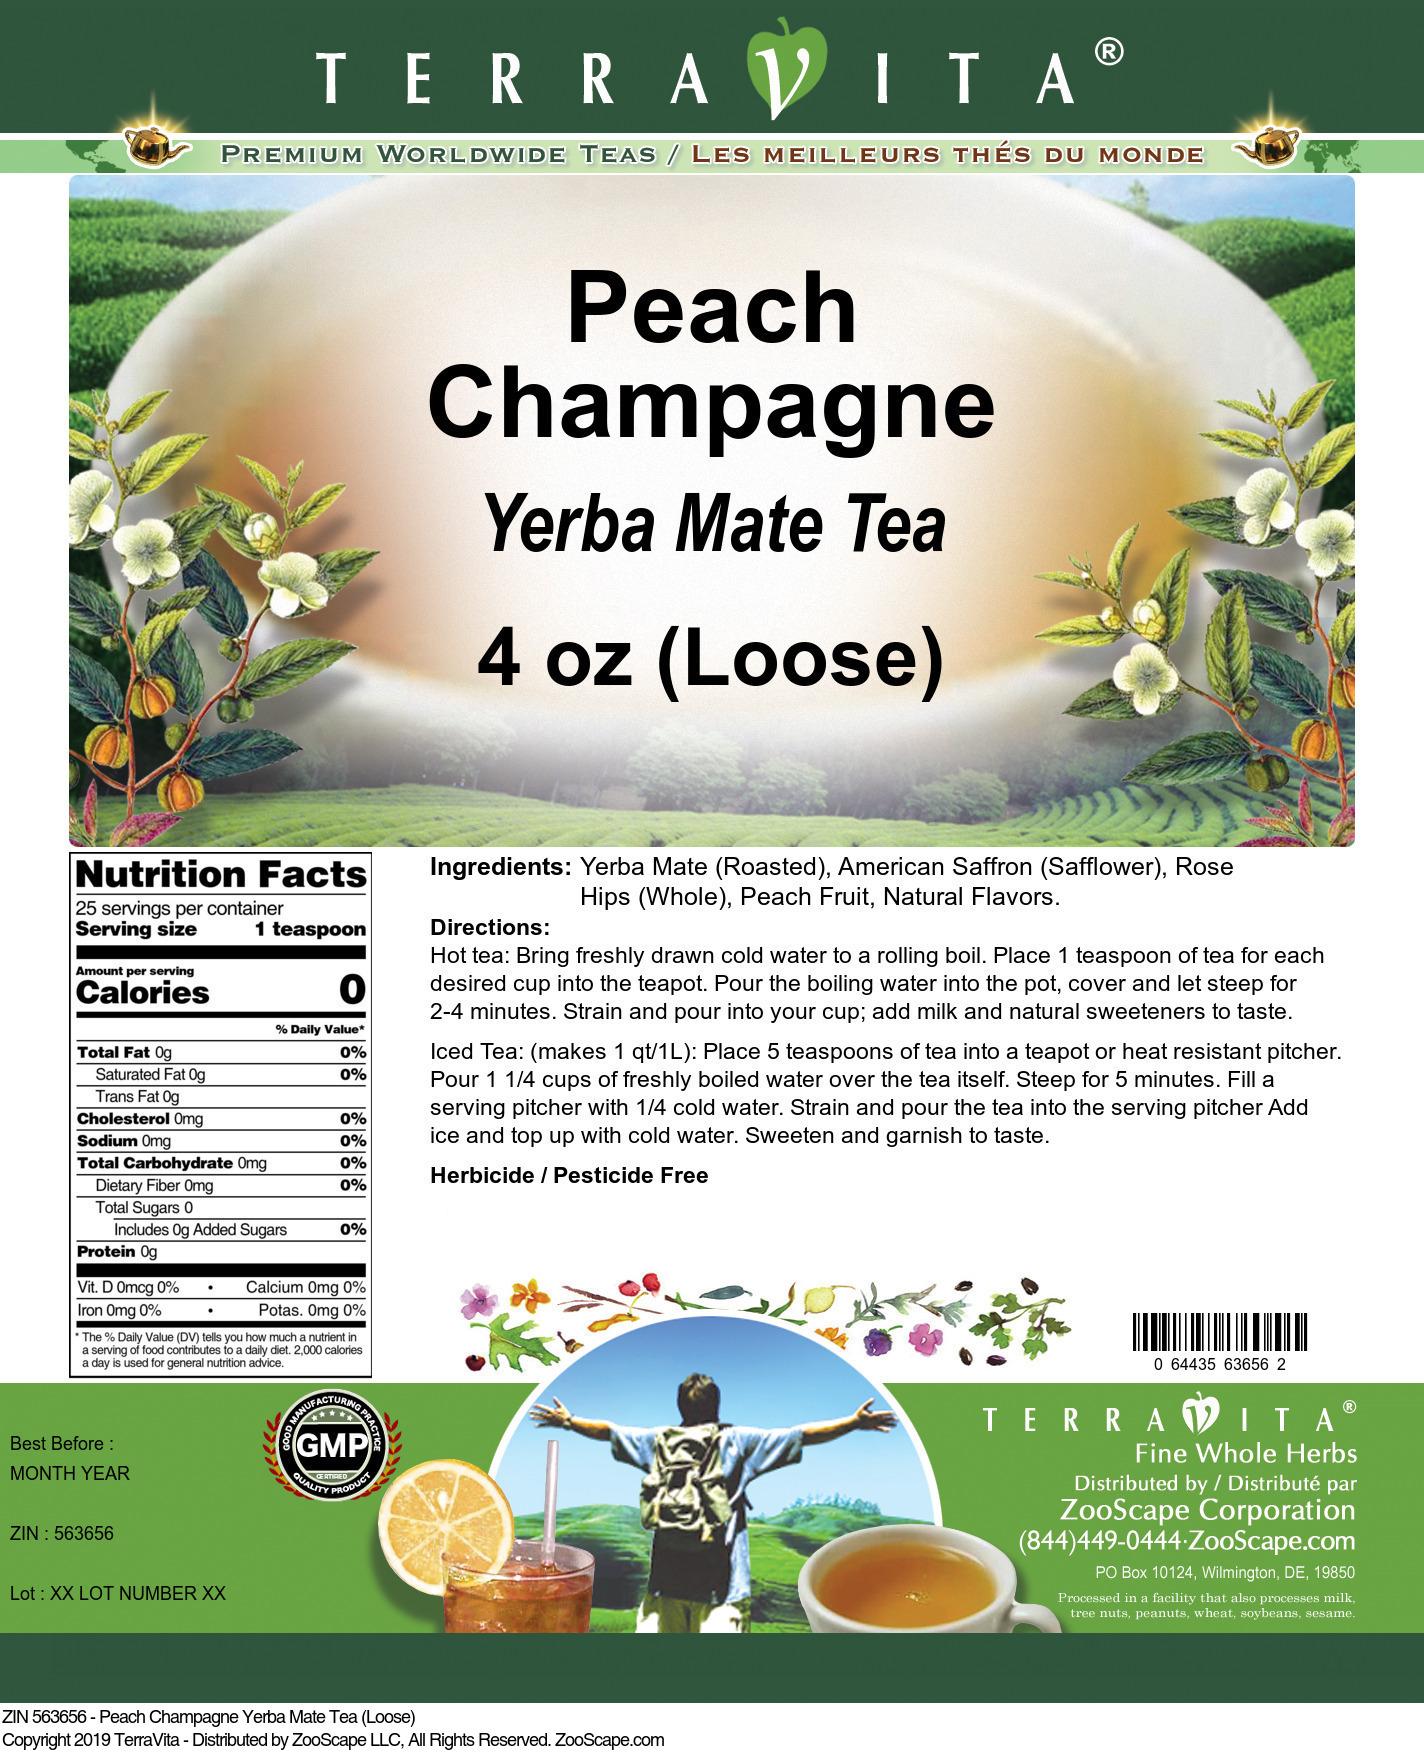 Peach Champagne Yerba Mate Tea (Loose)